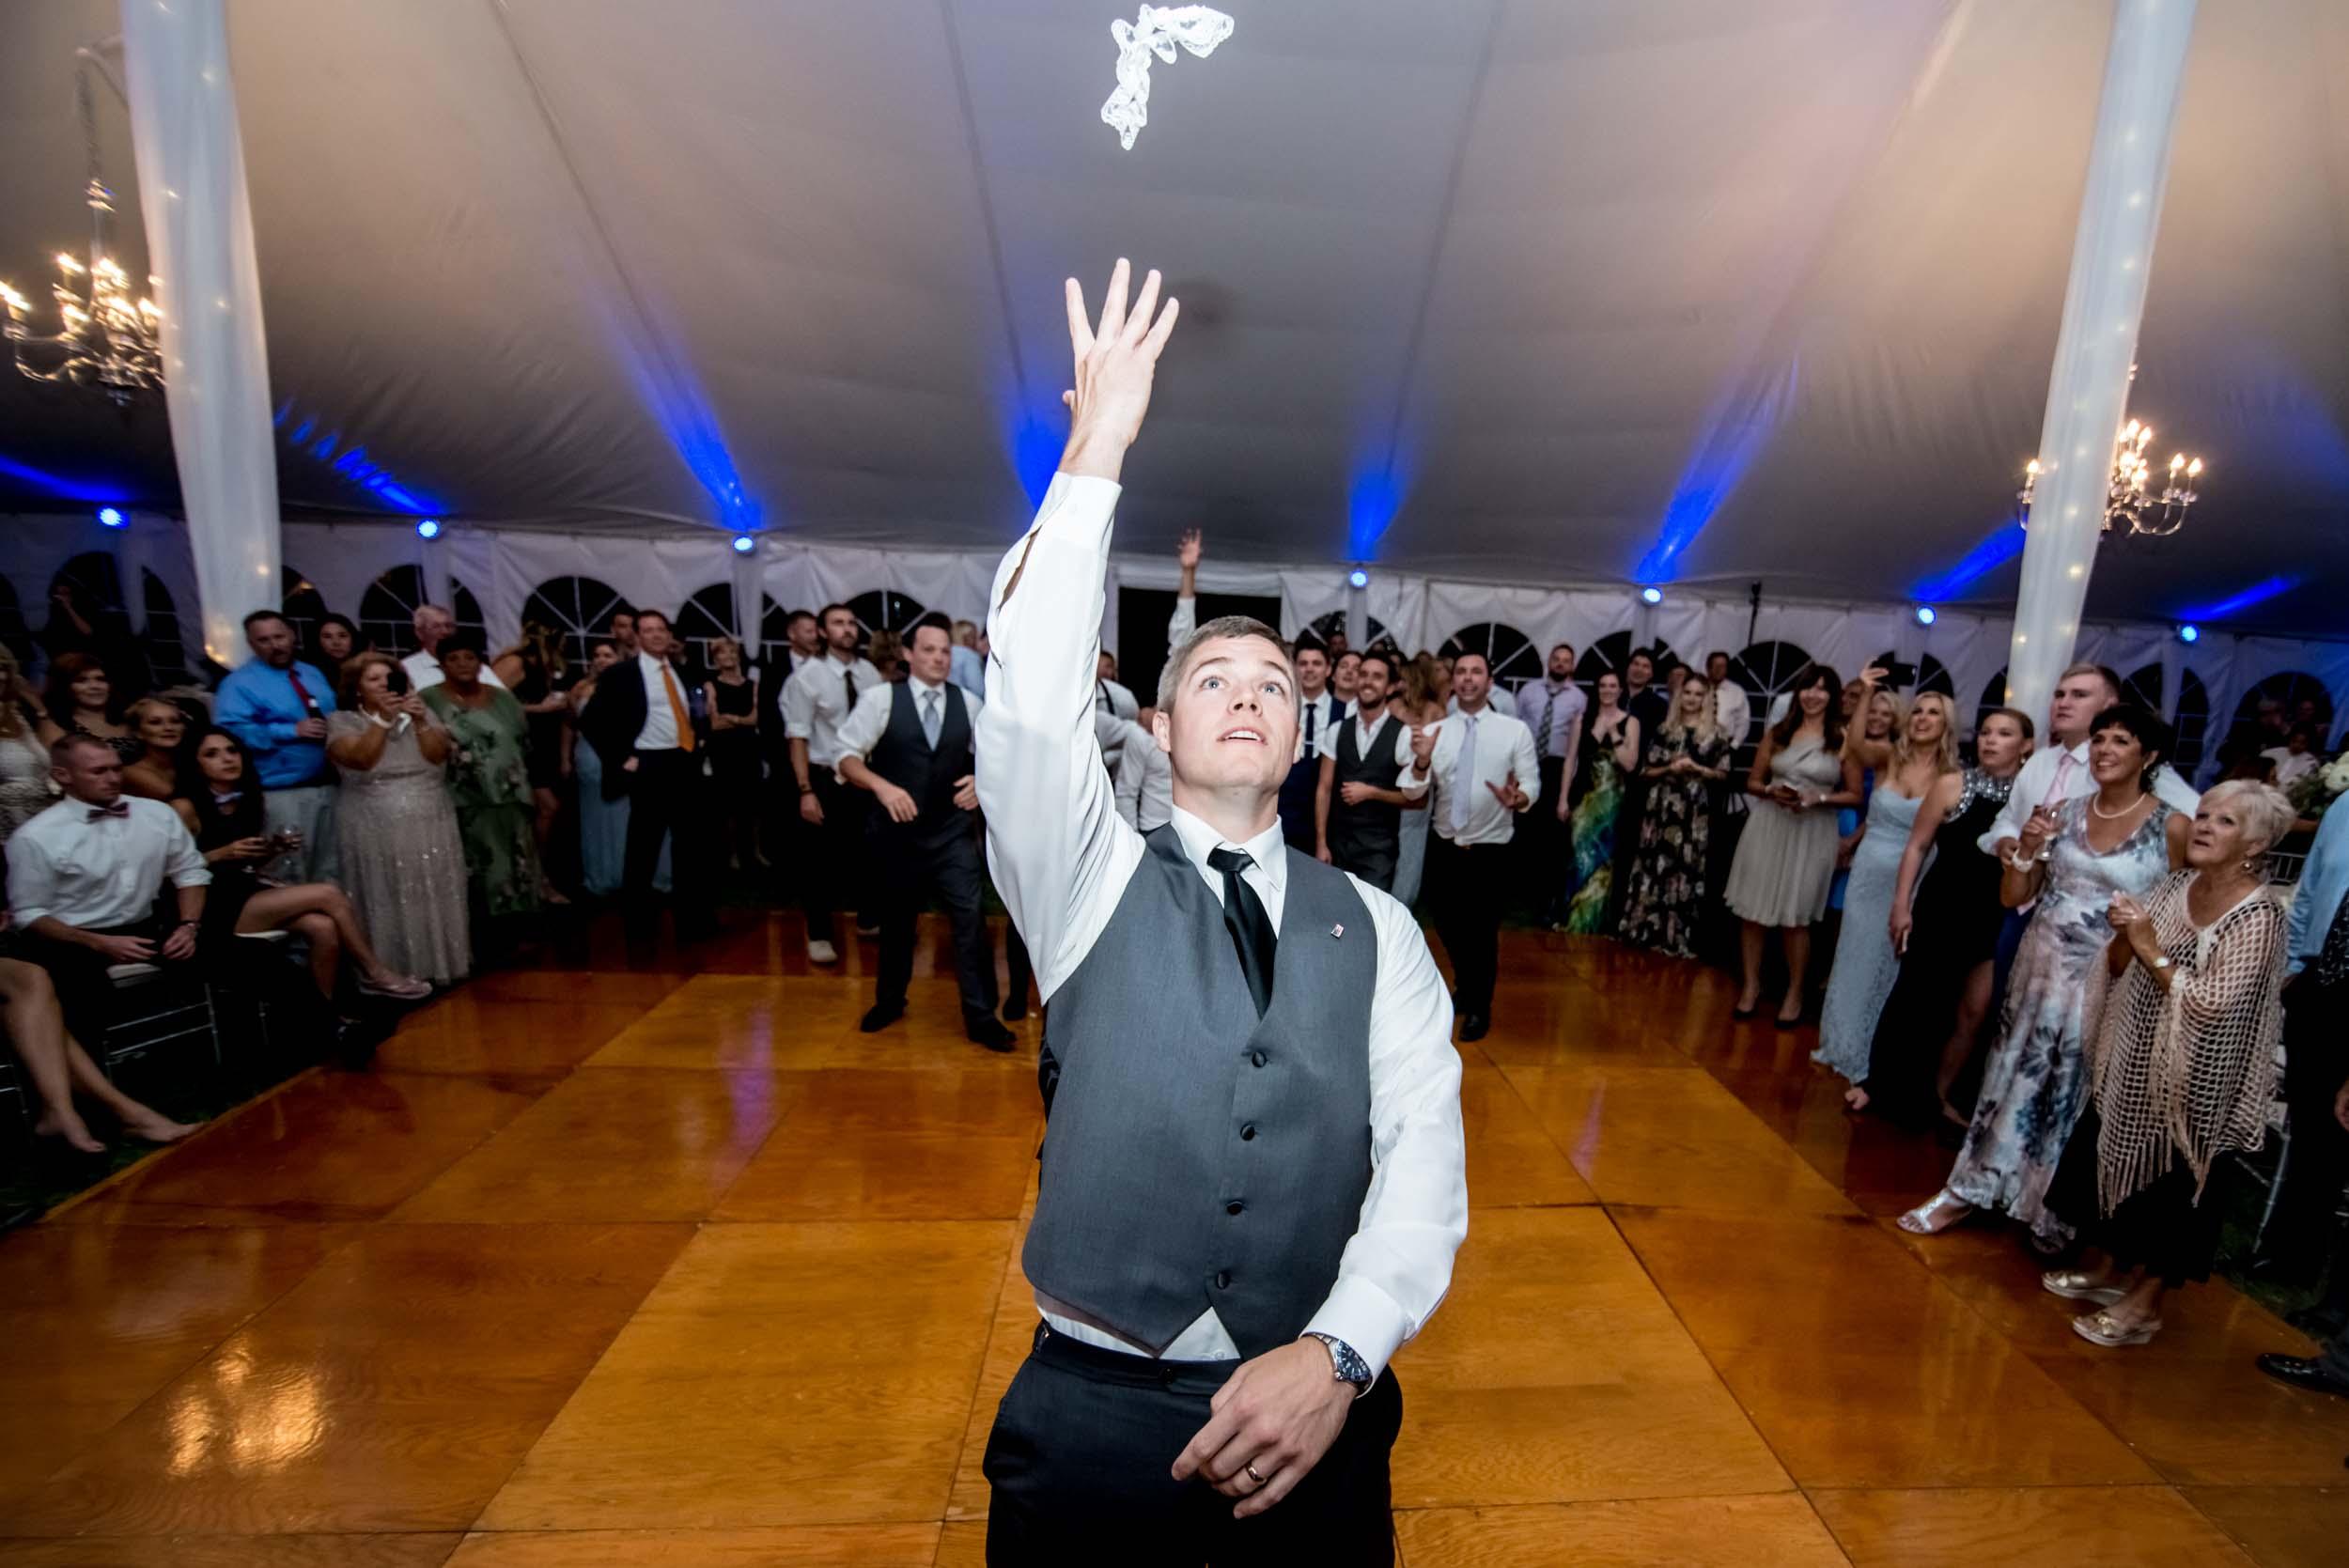 dc+metro+wedding+photographer+vadym+guliuk+photography+wedding+garter+toss-2025.jpg